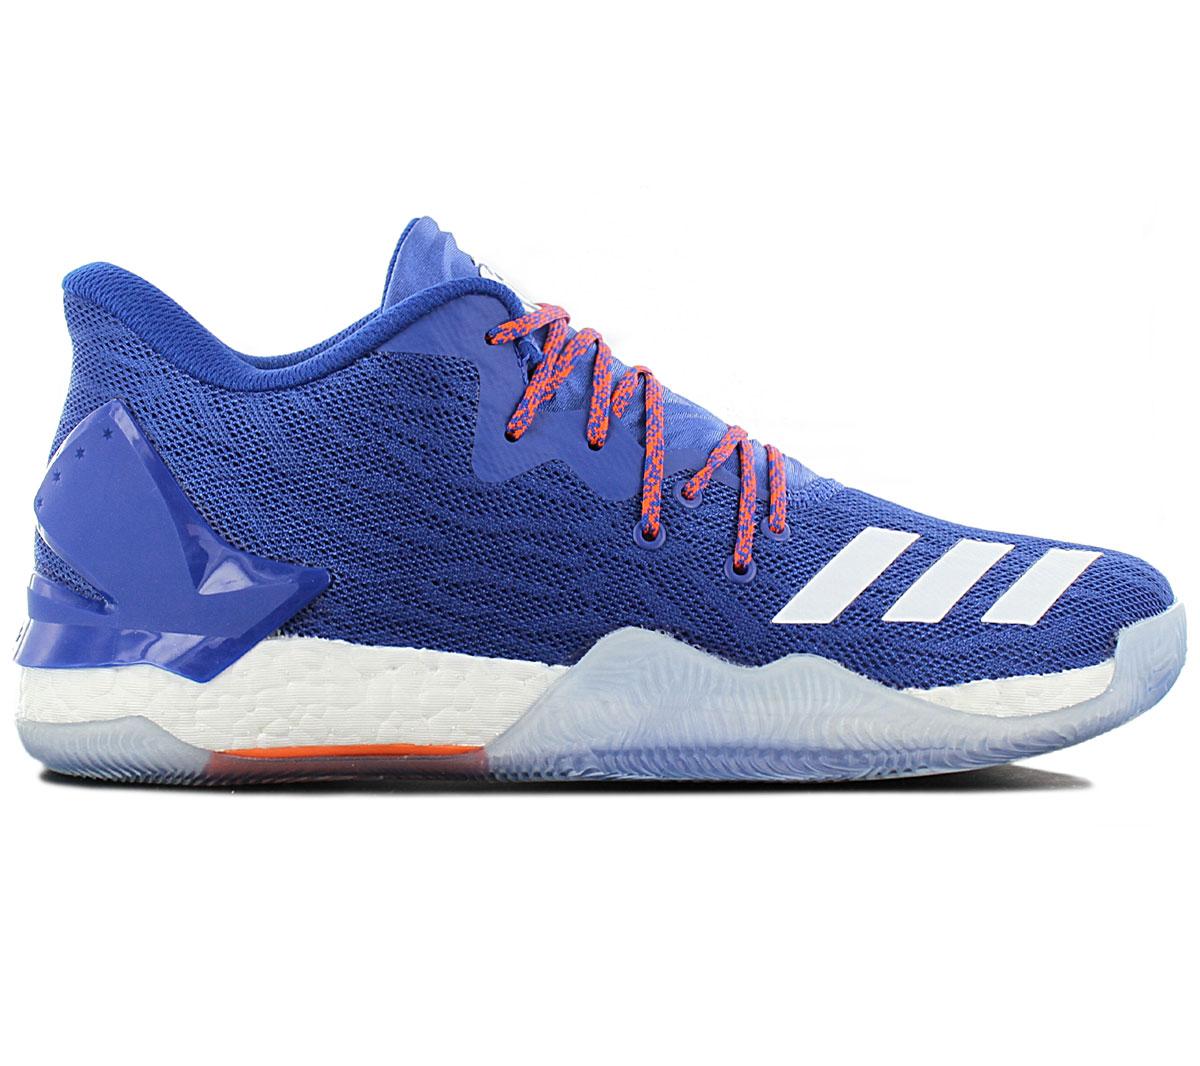 big sale e2dc0 71b97 Adidas Derrick D Rose Boost 7 Low Mens Basketballshoe By4499